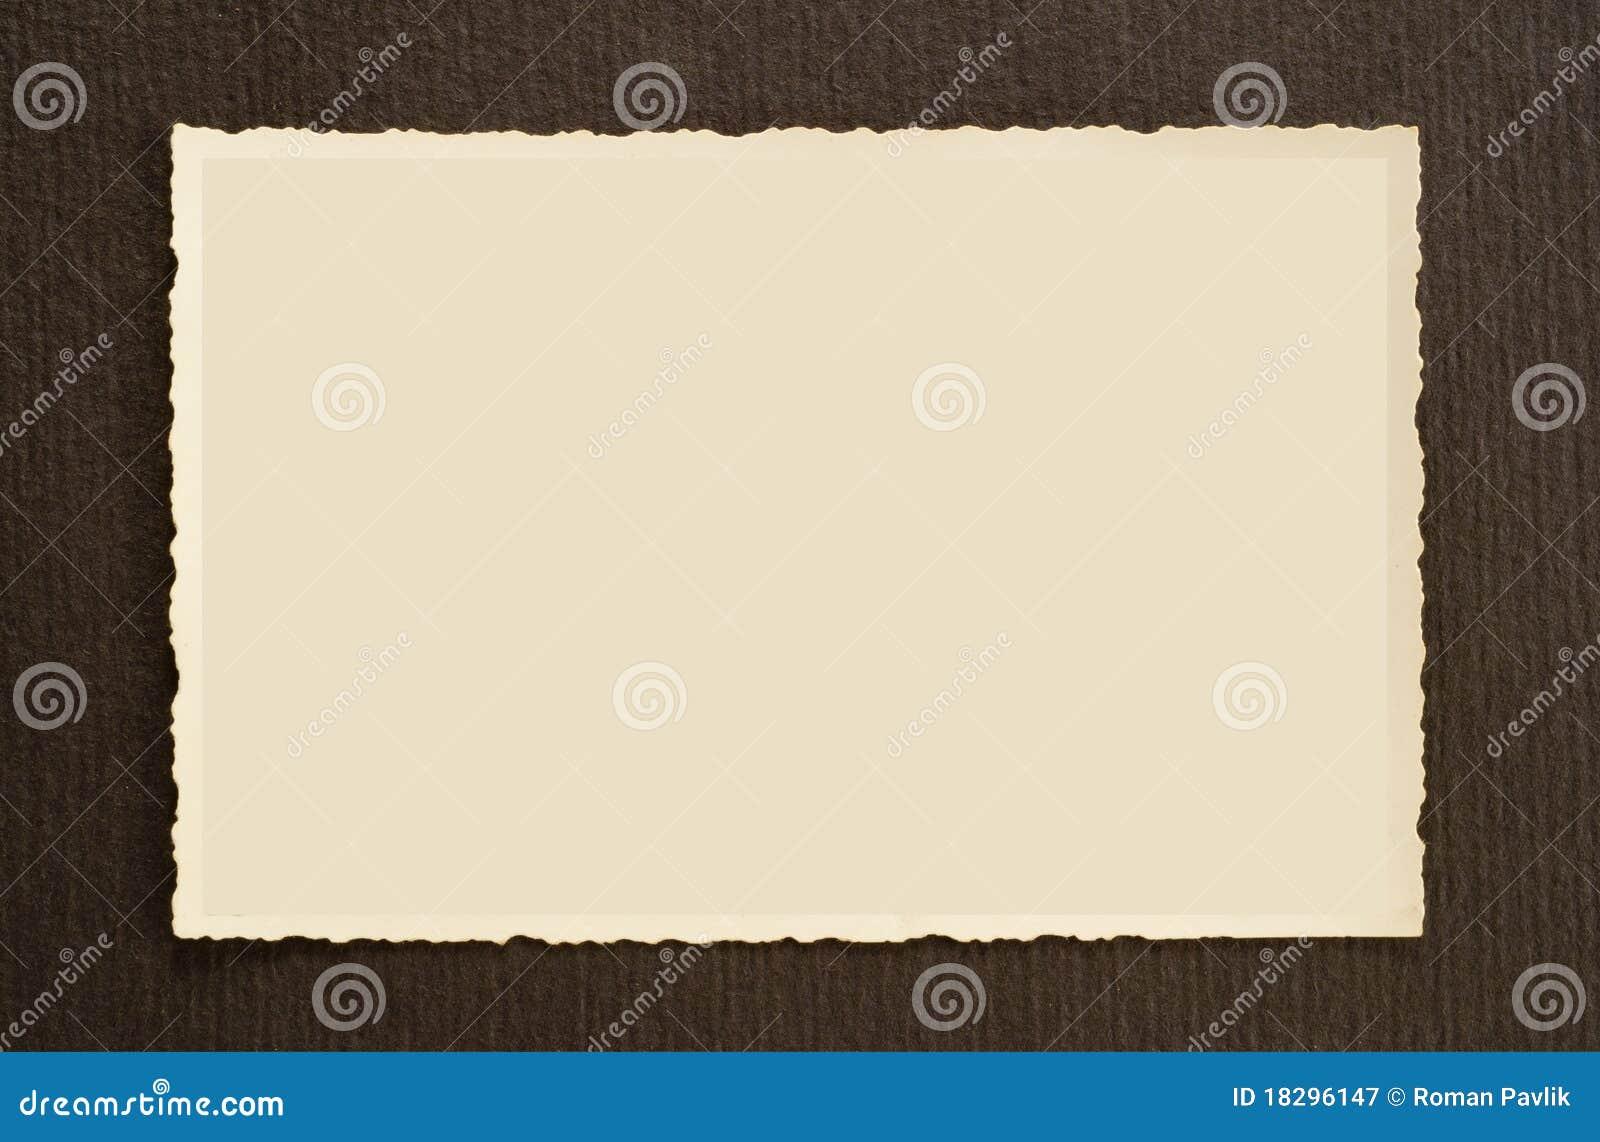 Old photo frames stock image. Image of camera, crop, border - 18296147